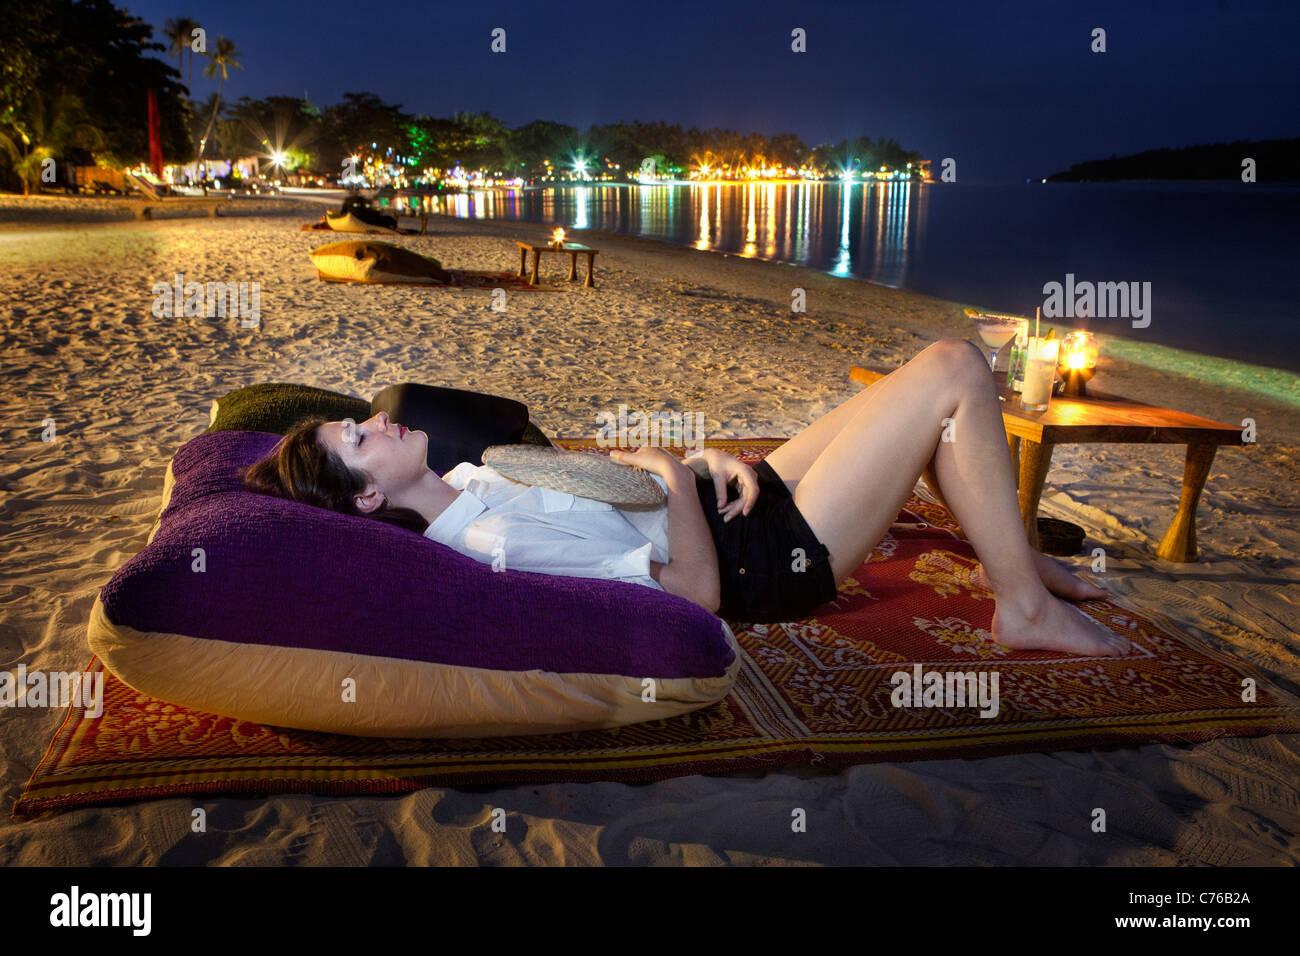 Young woman reclining on a cushion on a Thai beach at night (Ko Samui, Thailand) Stock Photo